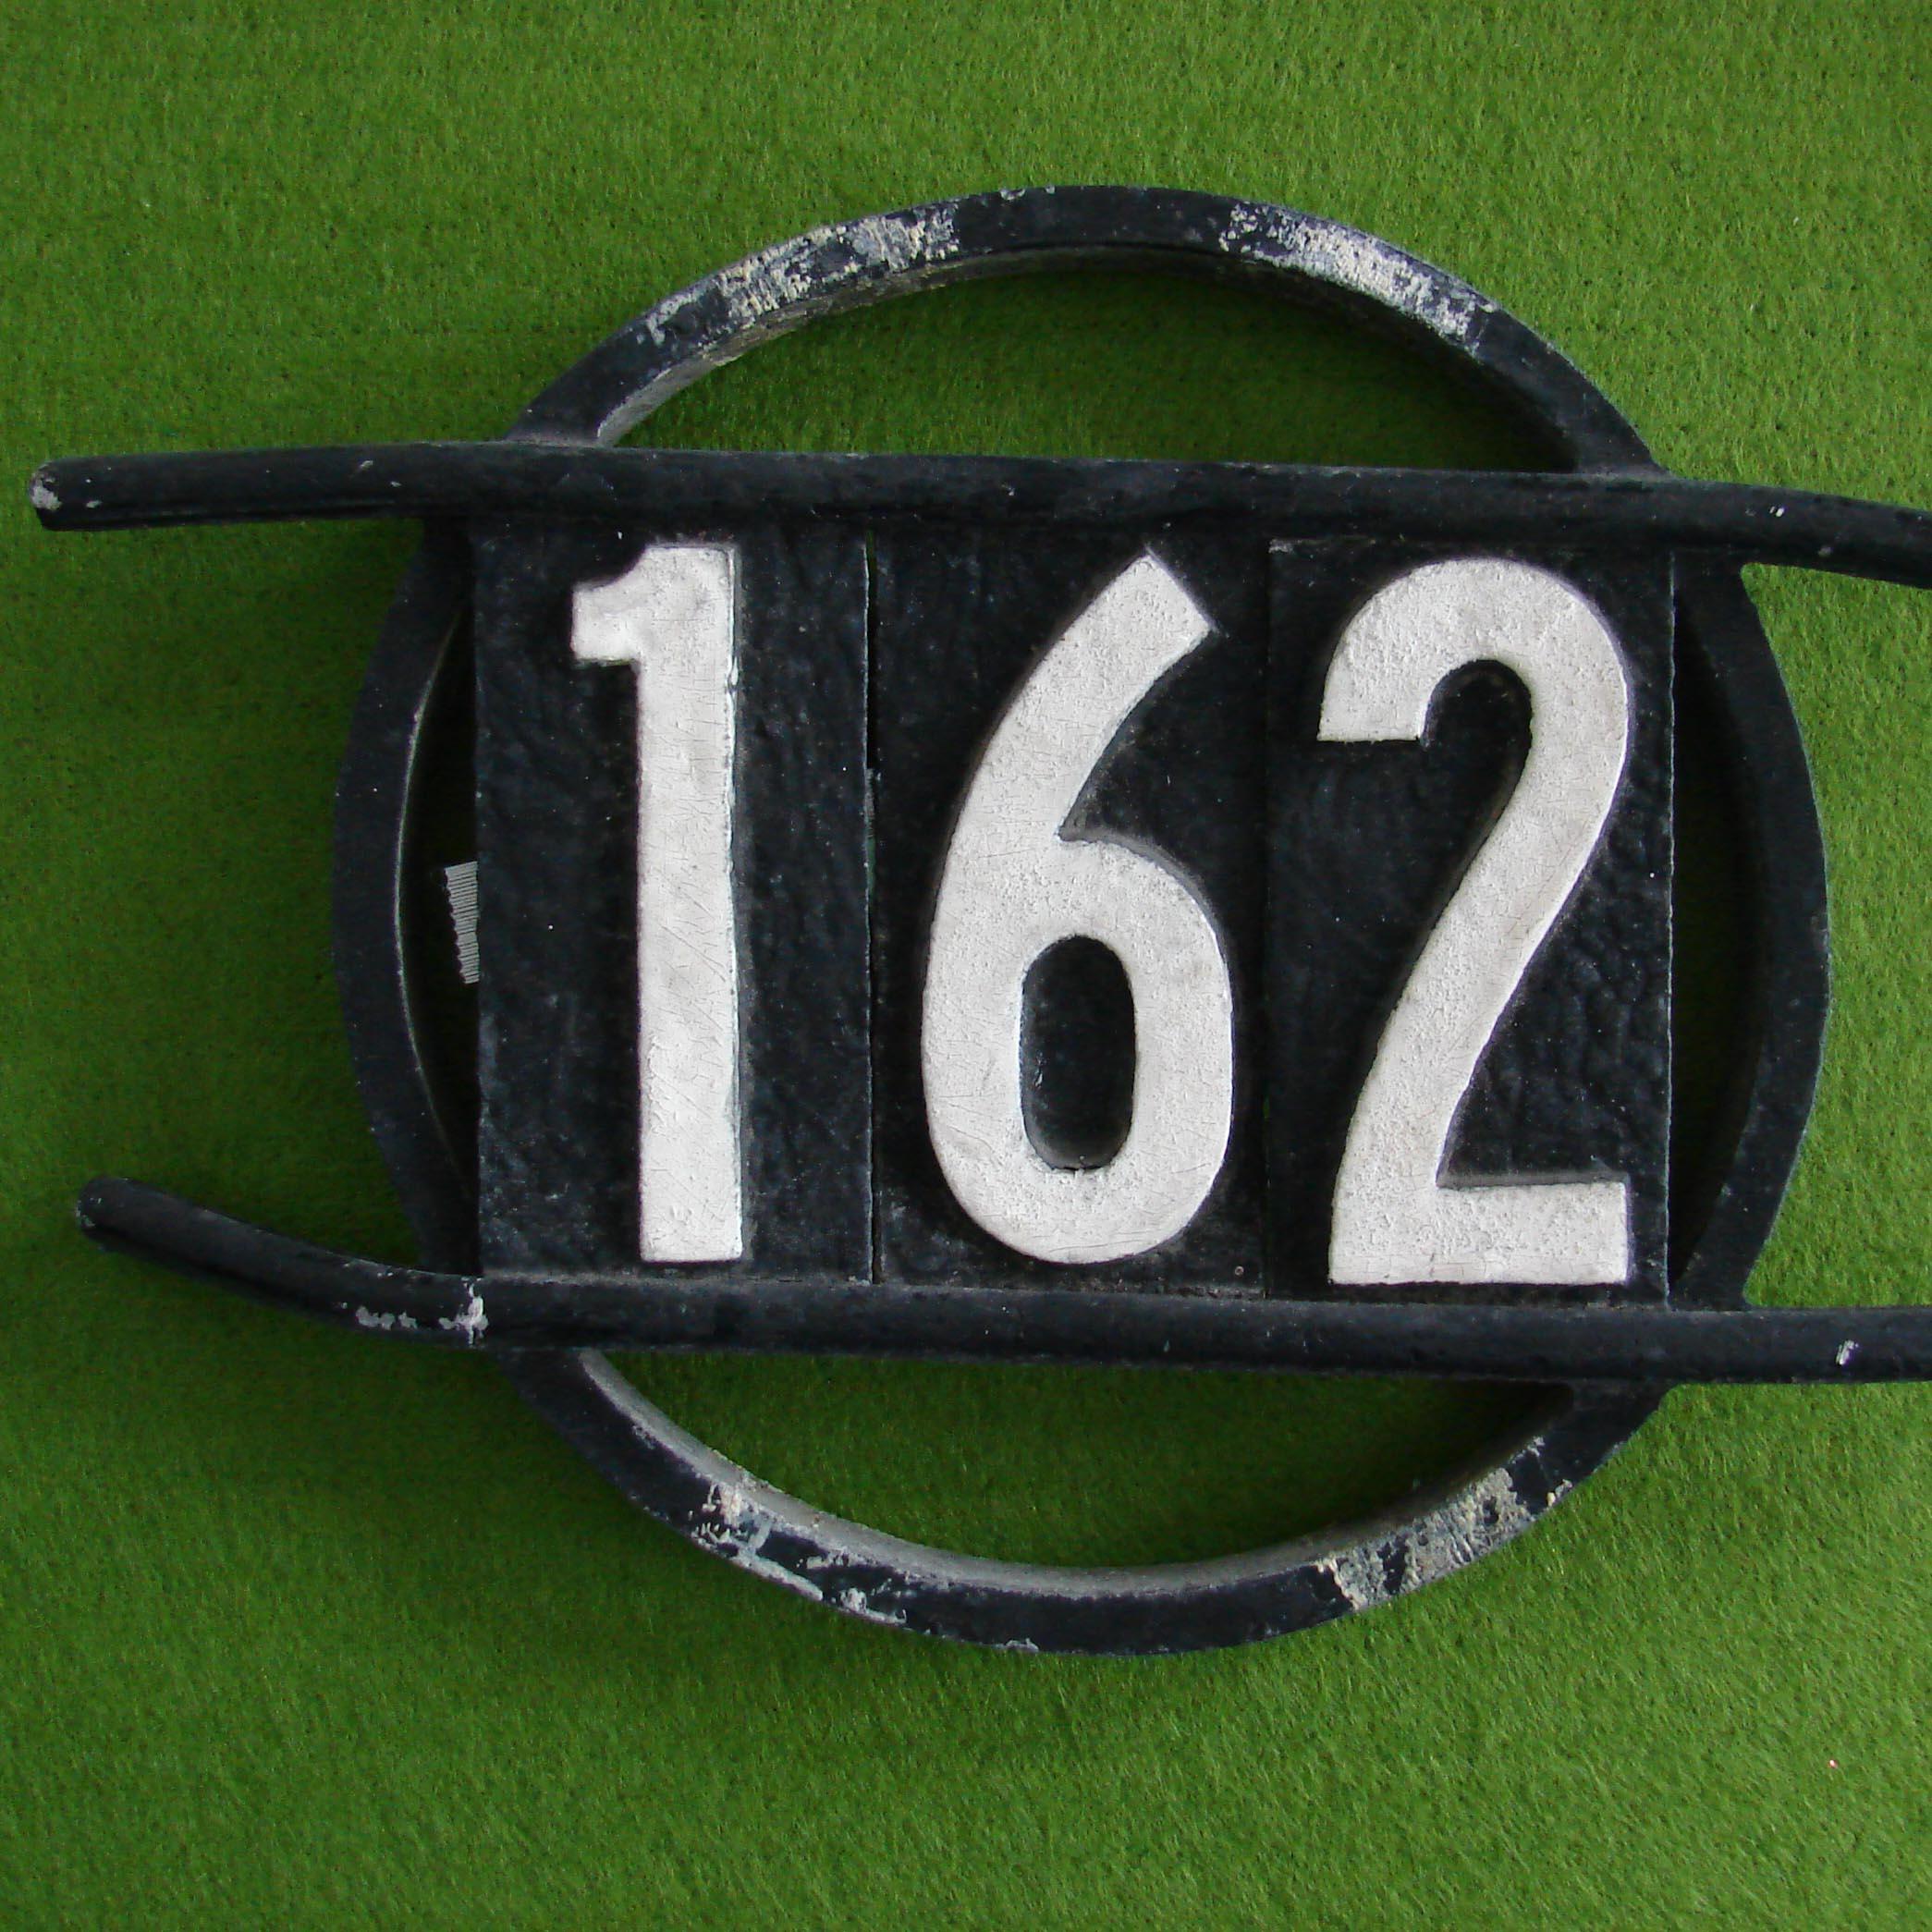 File:House number 162.jpg